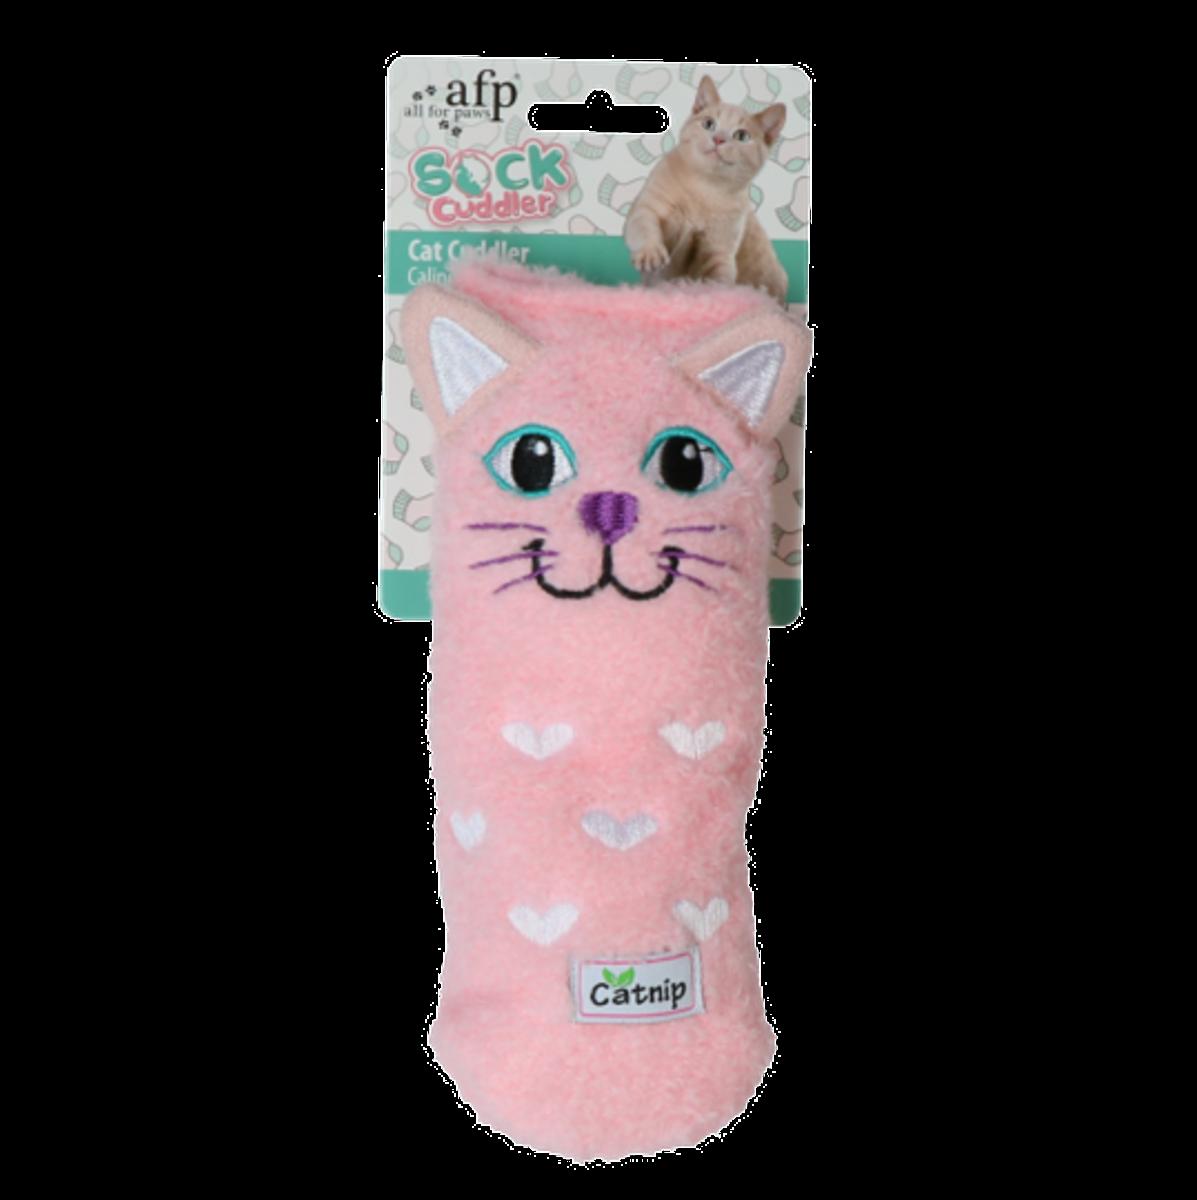 Katteleke afp Sock cuddler